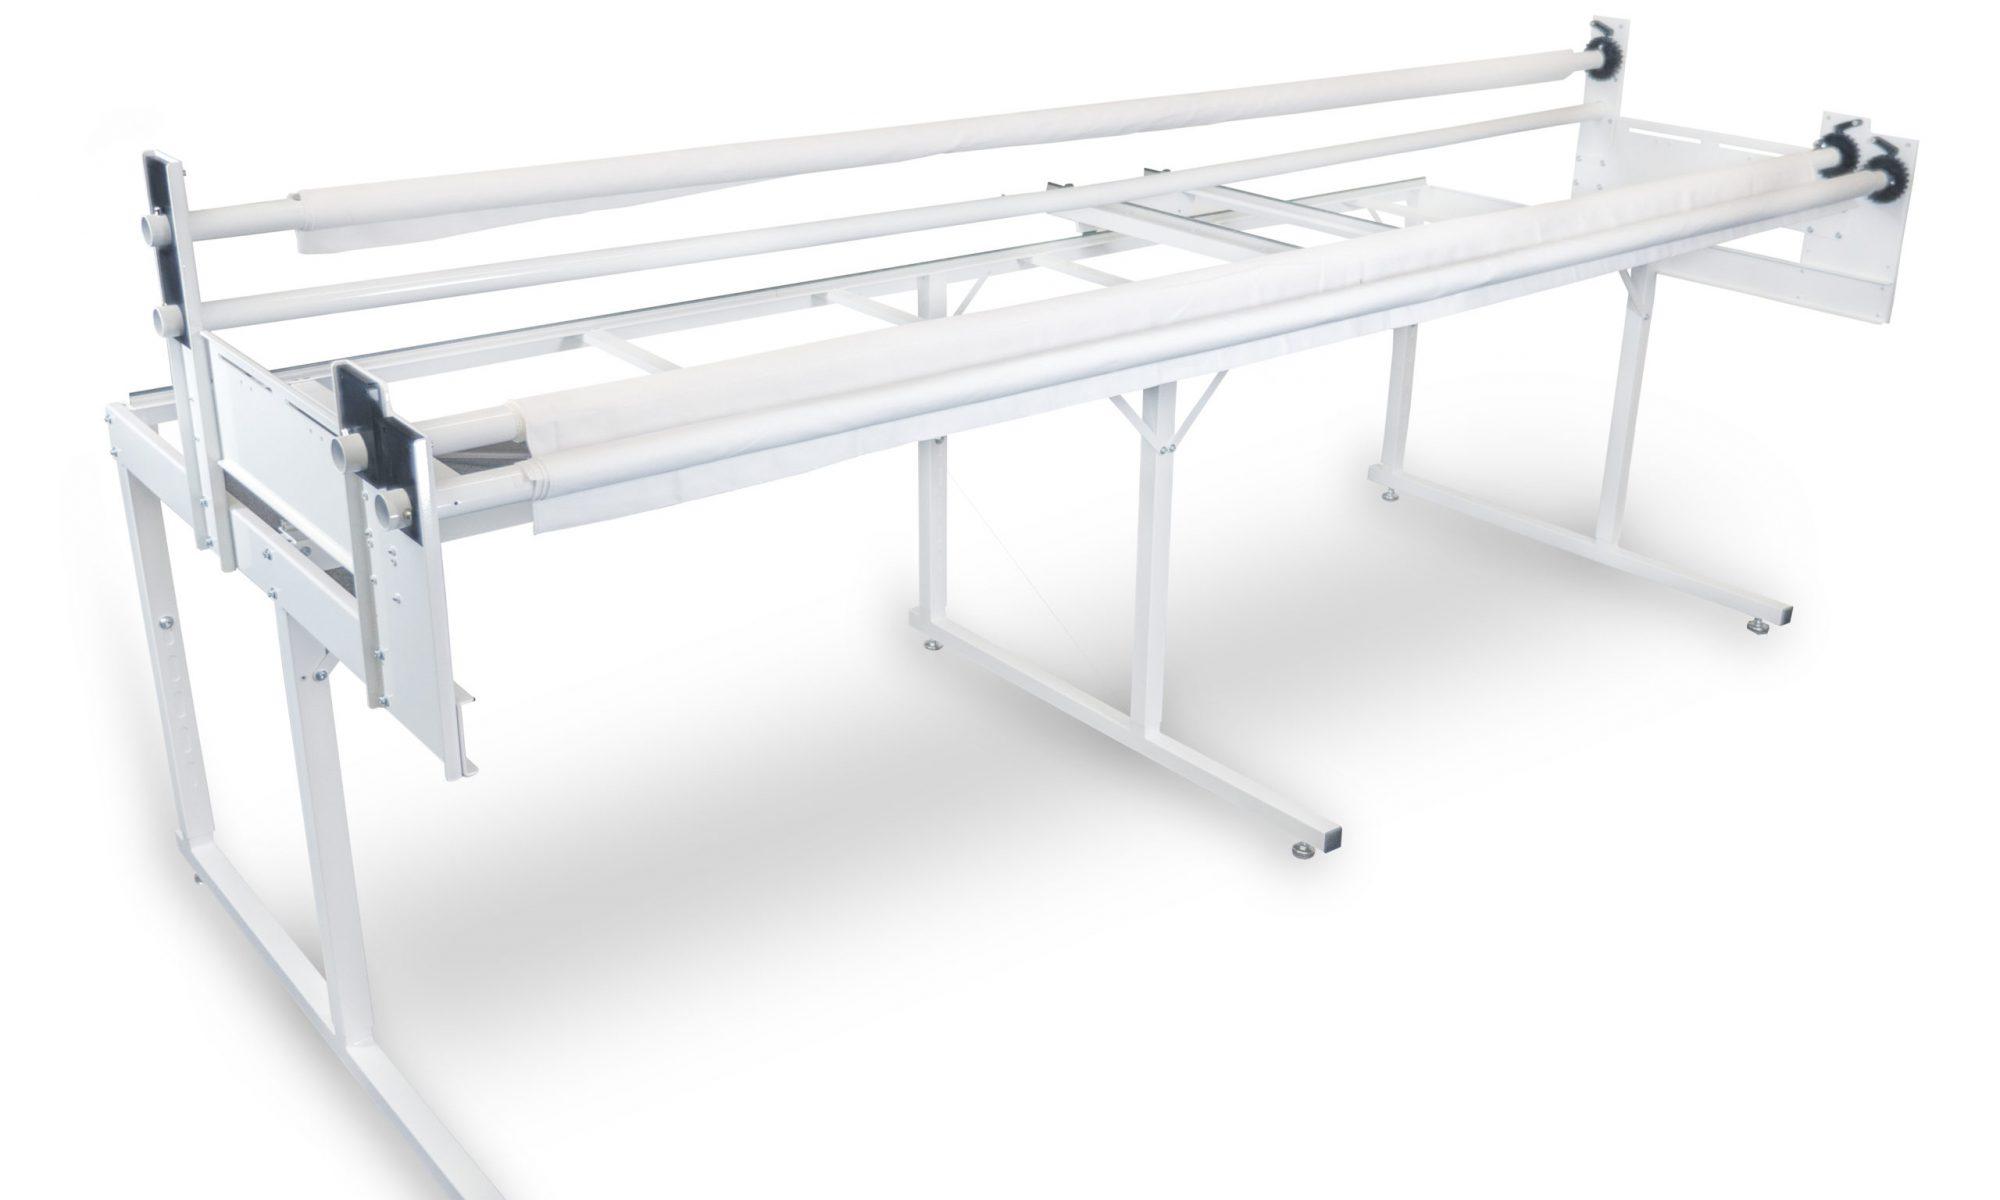 8 footr Loft frame